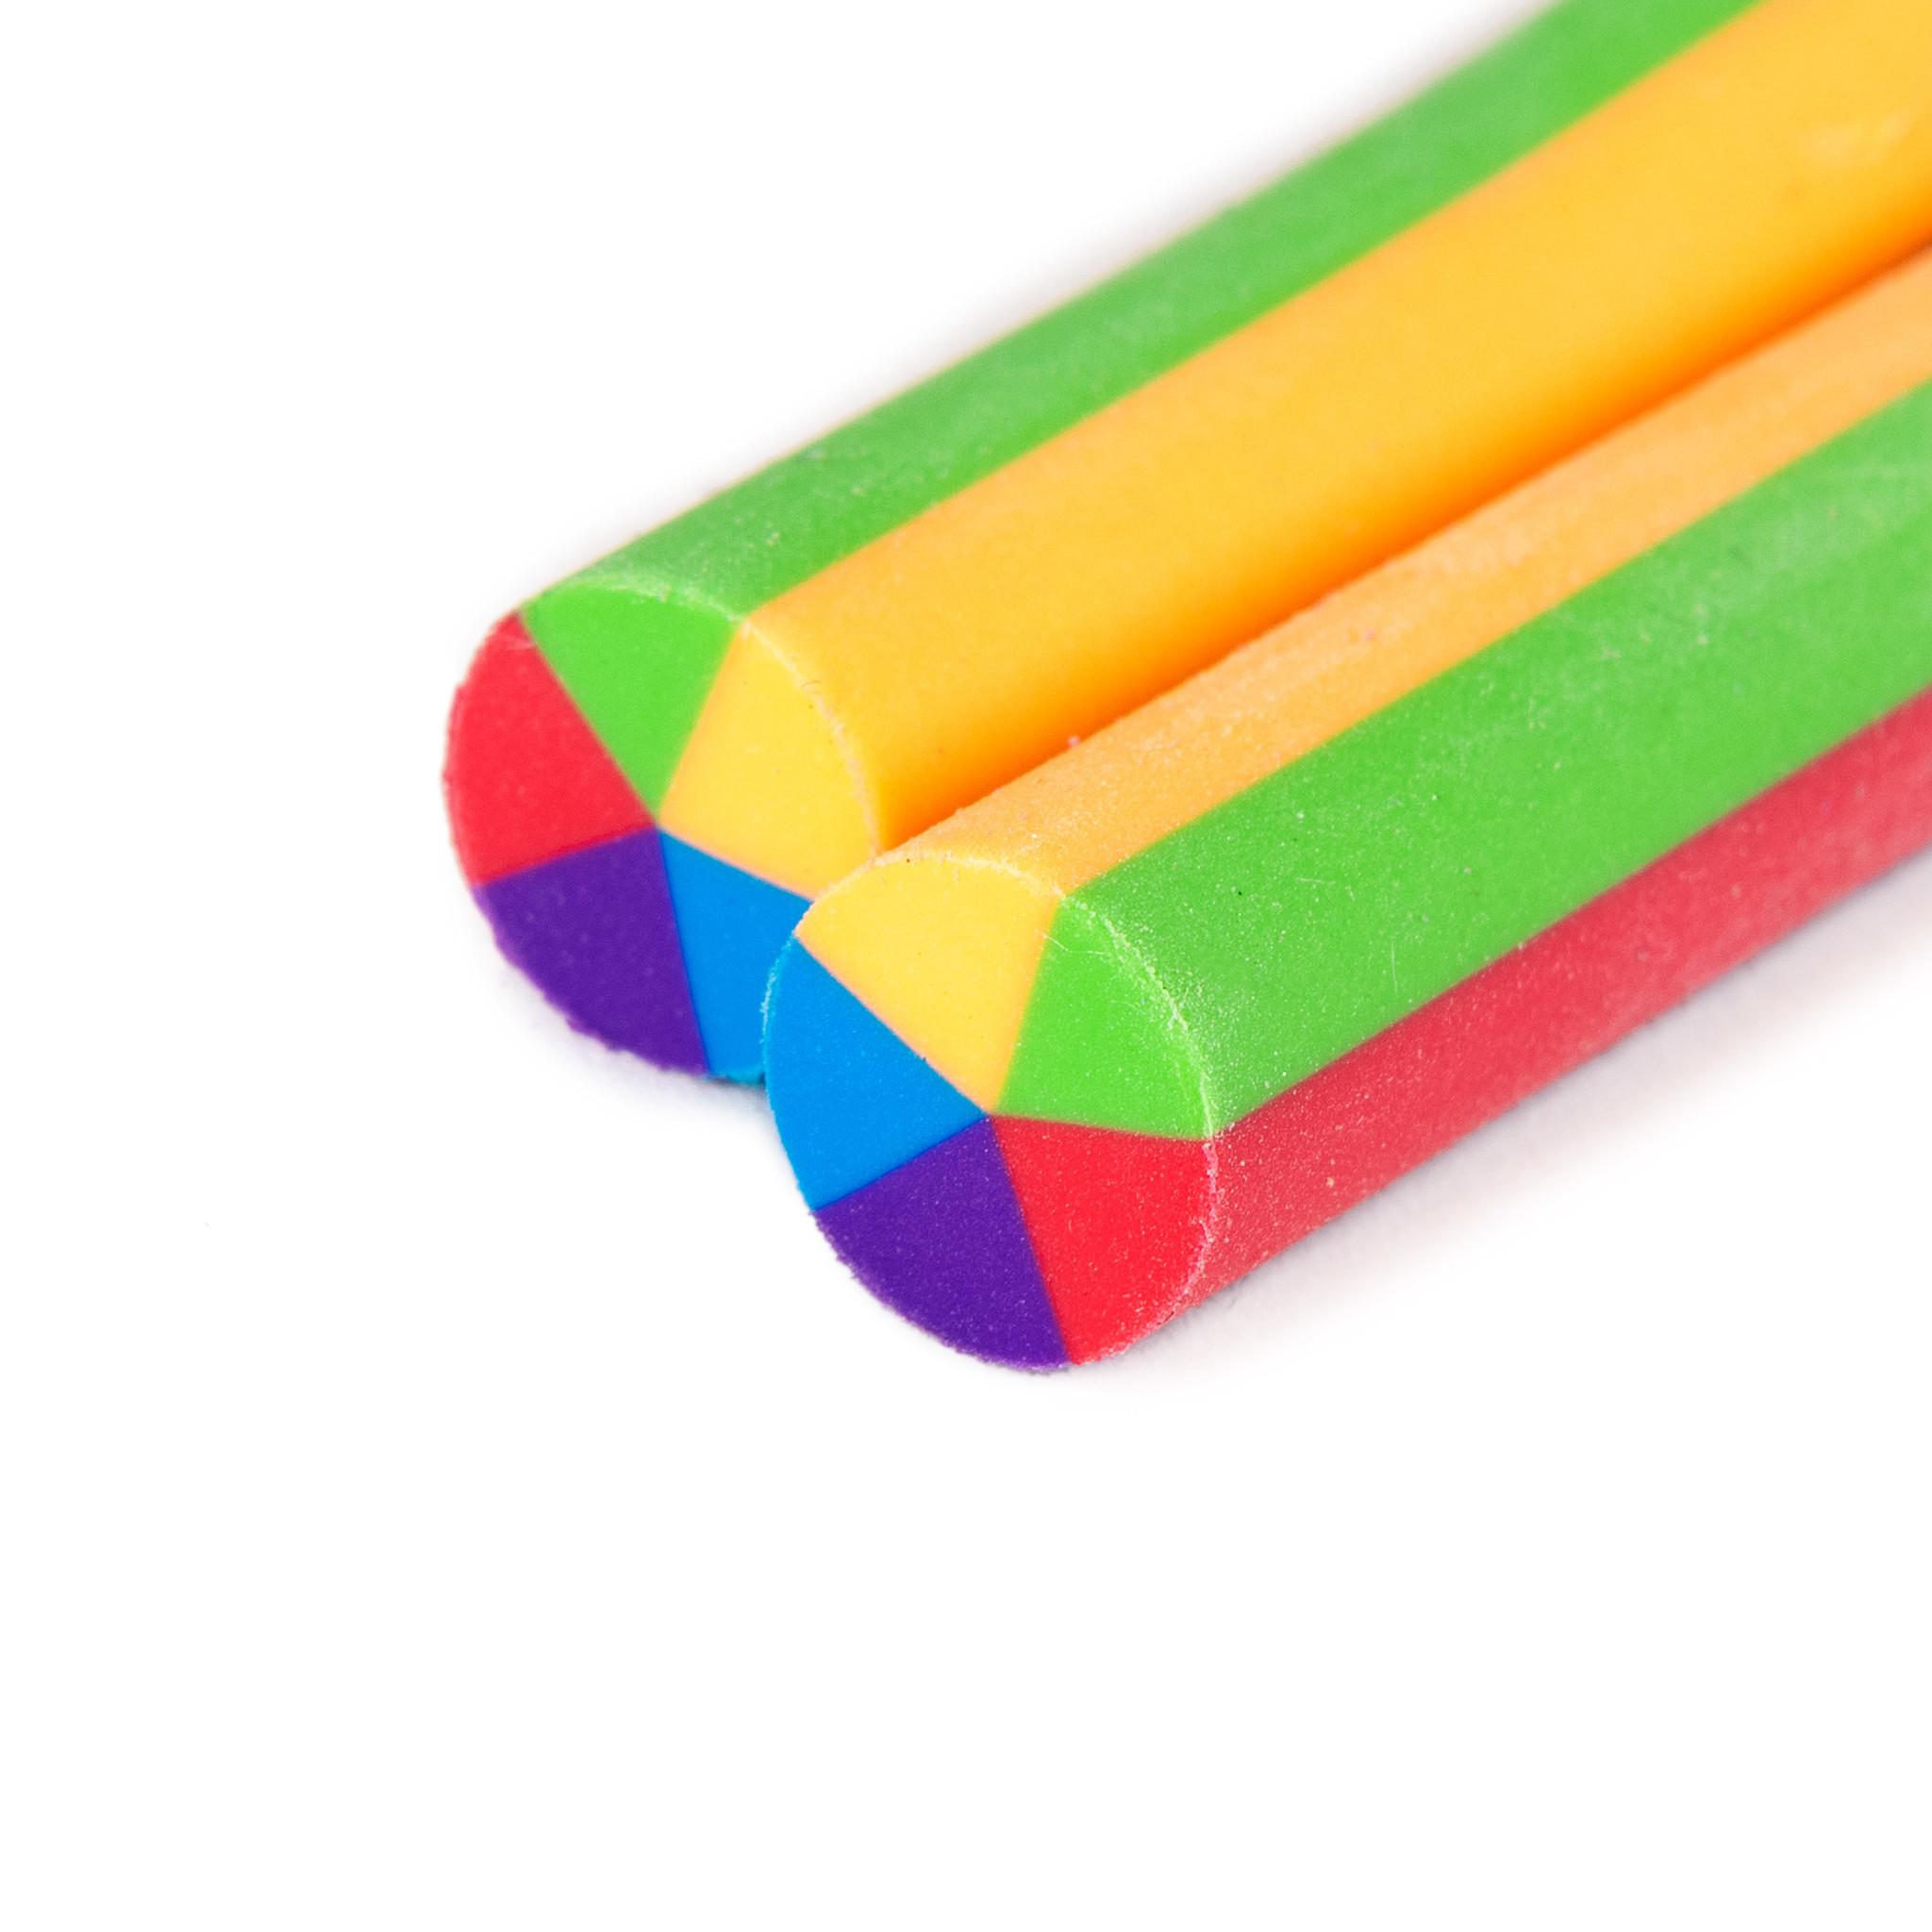 Bendy eraser